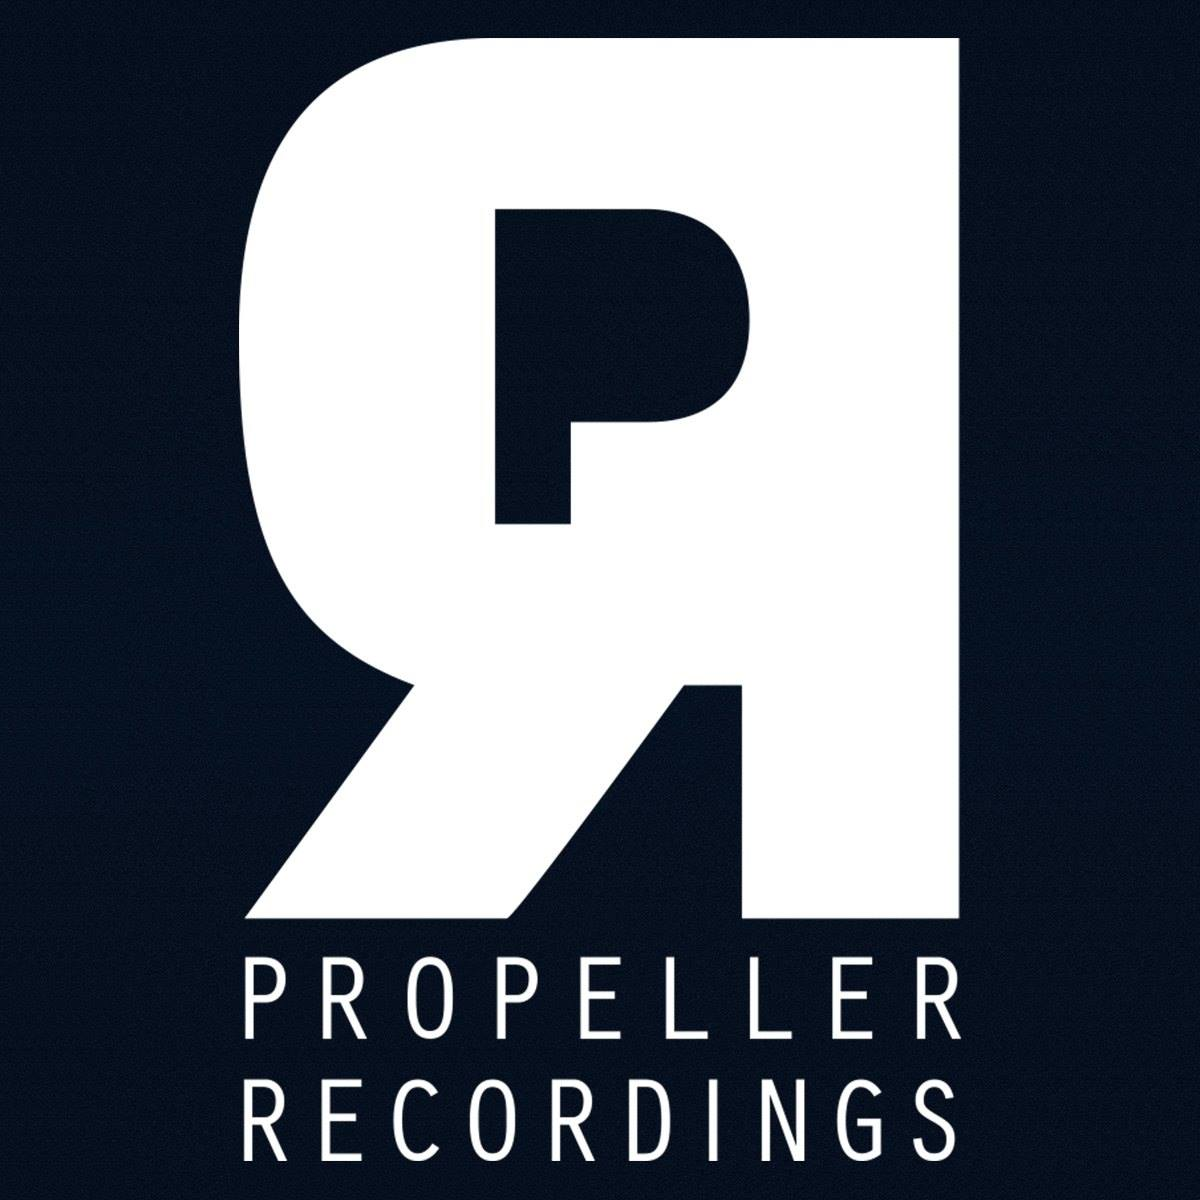 Propeller Recordings